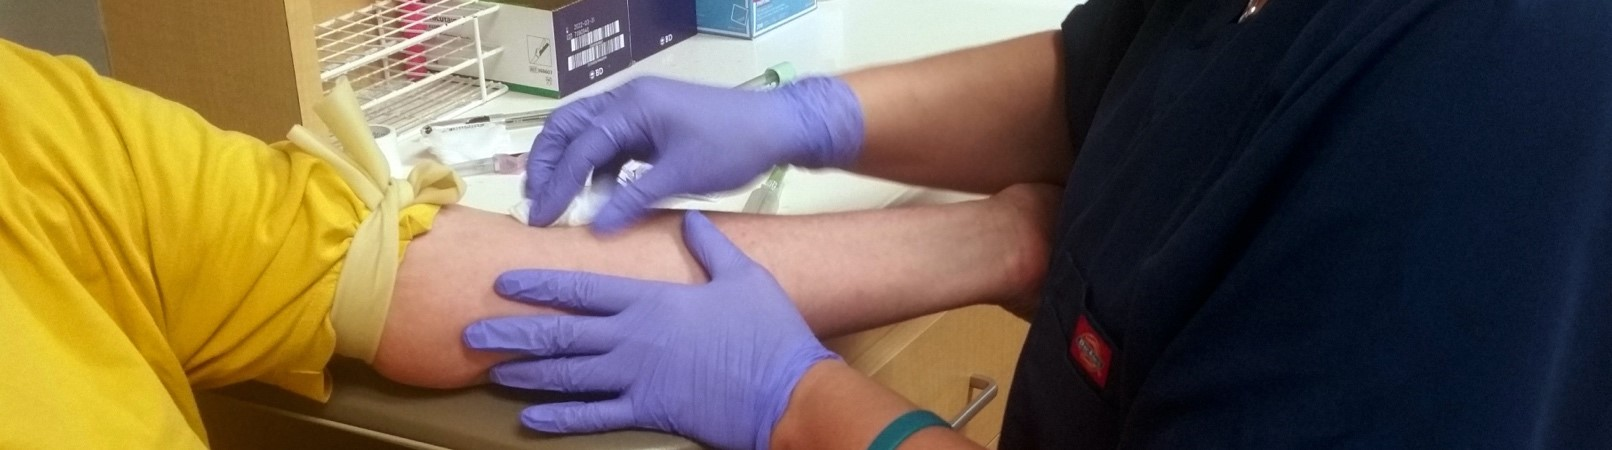 Beacon Biomedical S Bescreened Crc Test Receives Cpt Reimbursement Code Azbio